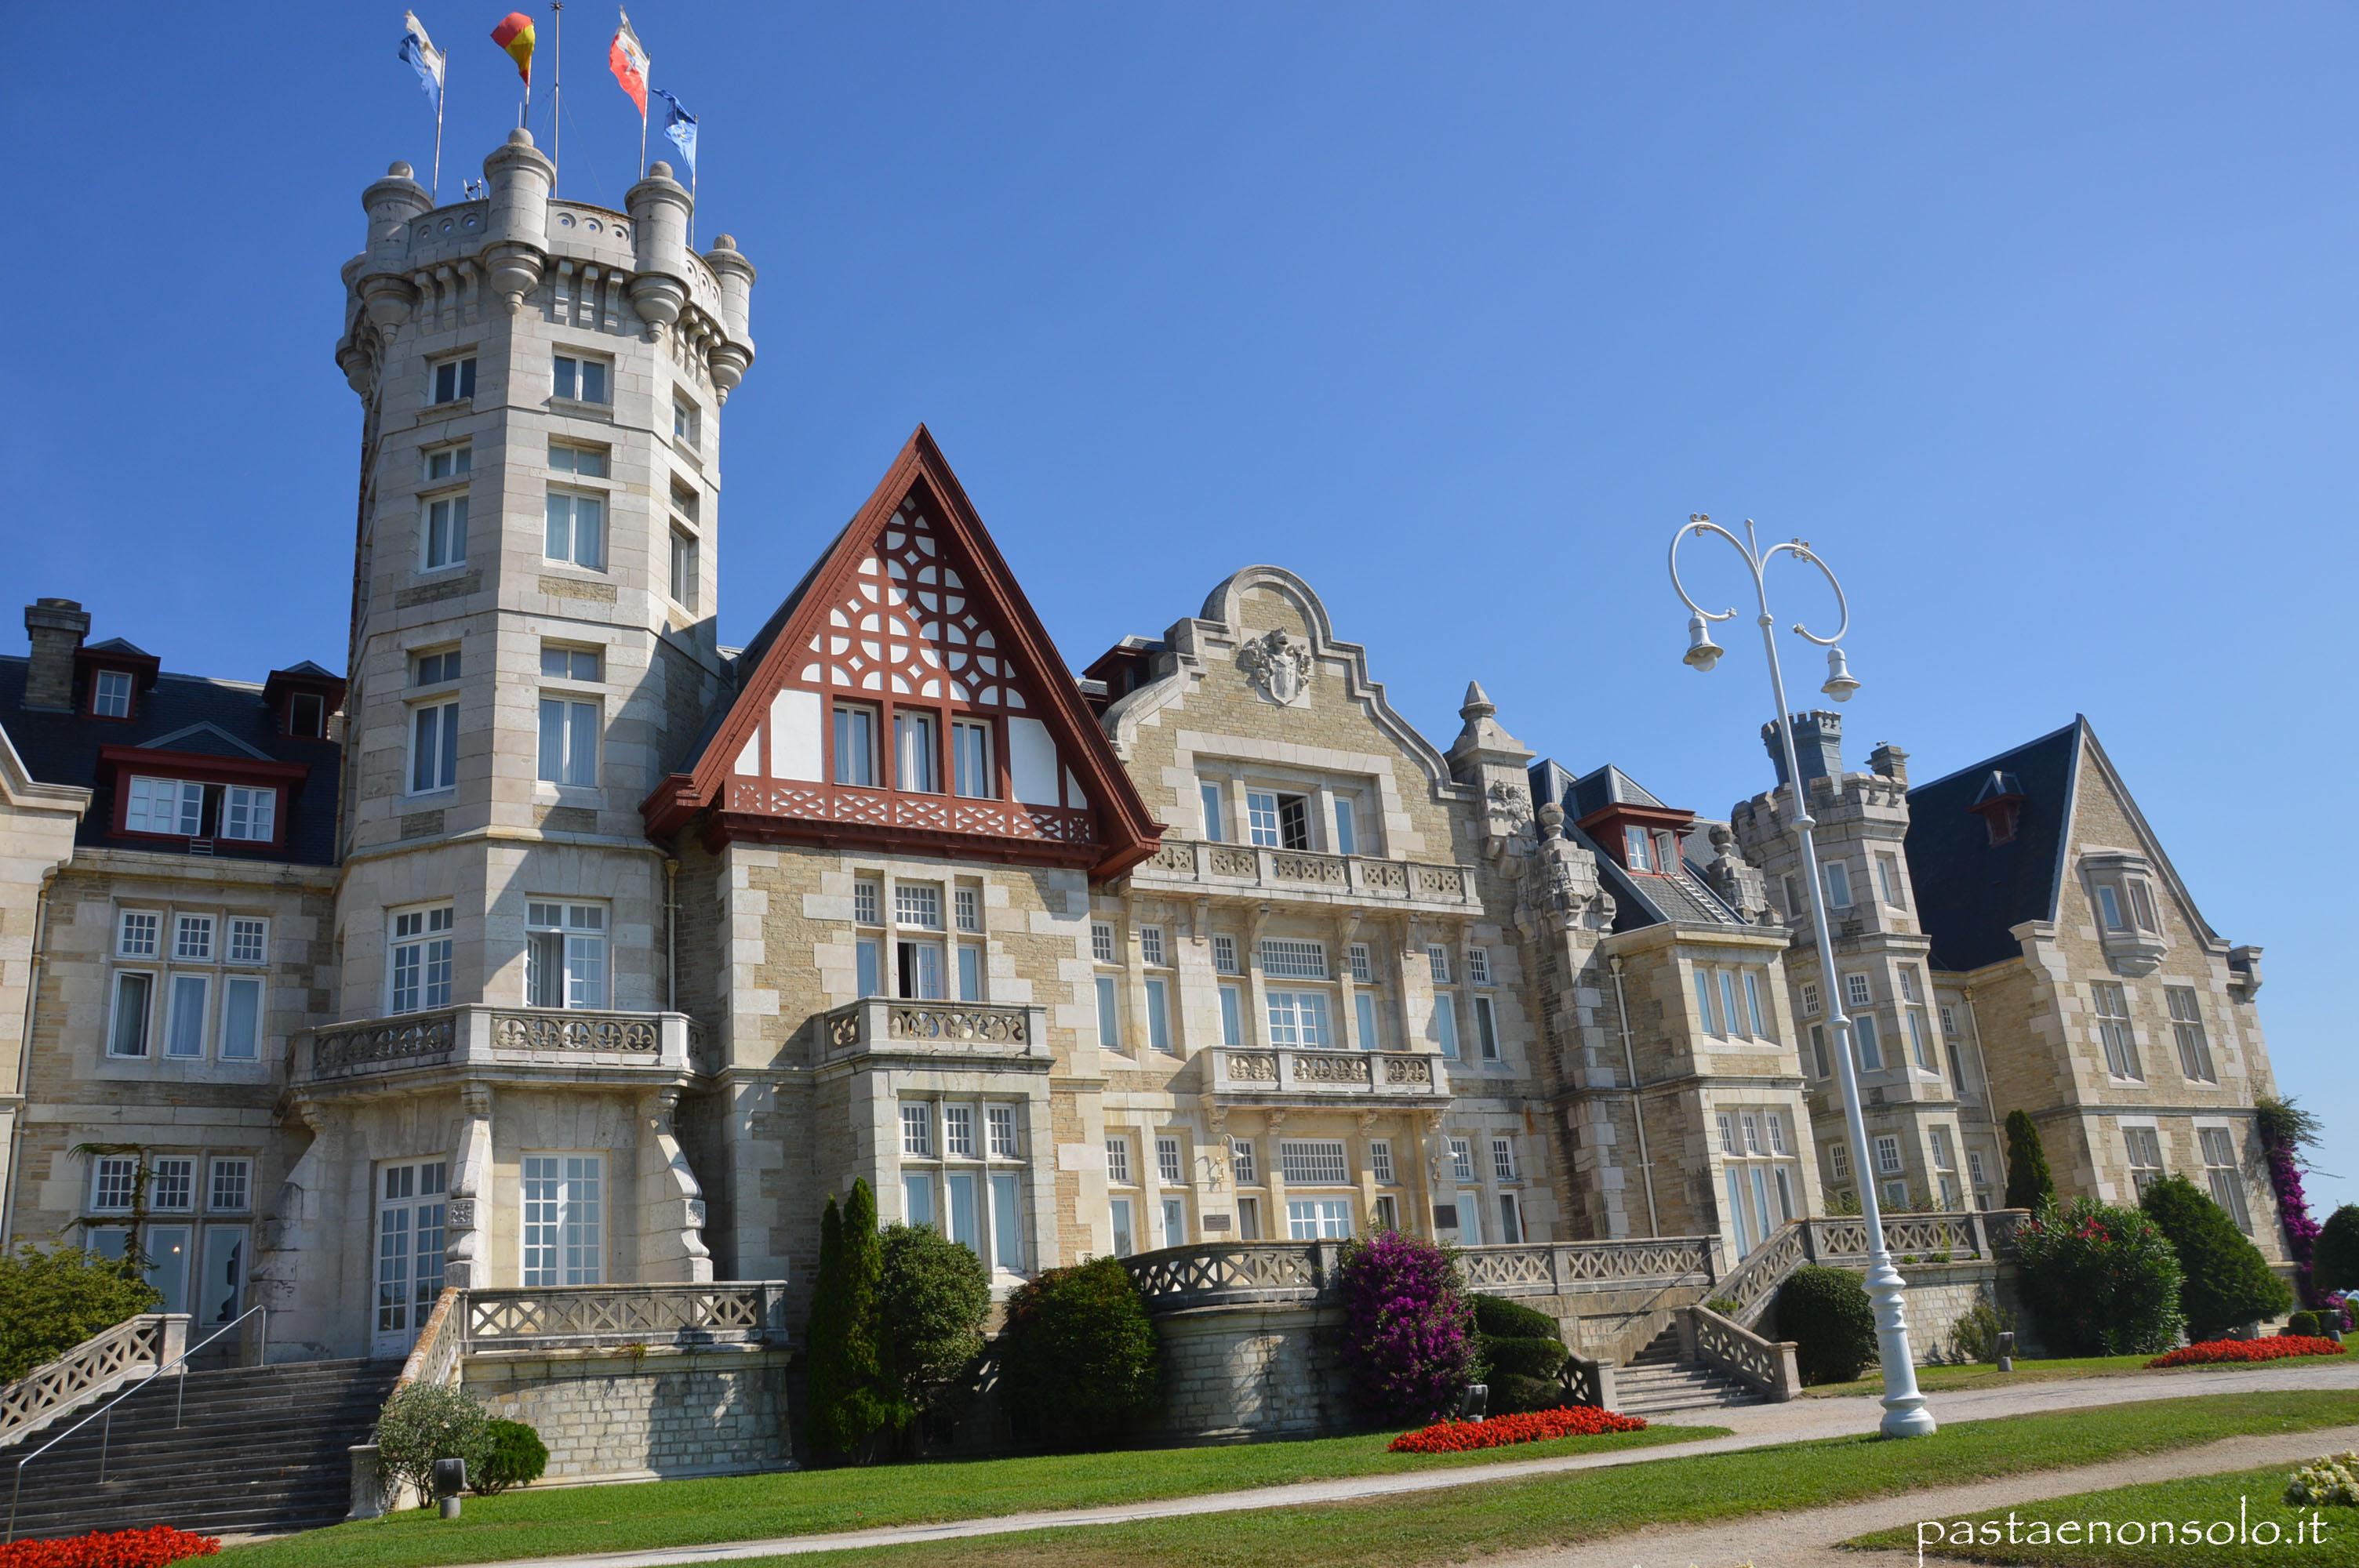 vacanza in Spagna: Santander, San Sebastian, Bilbao prima parte